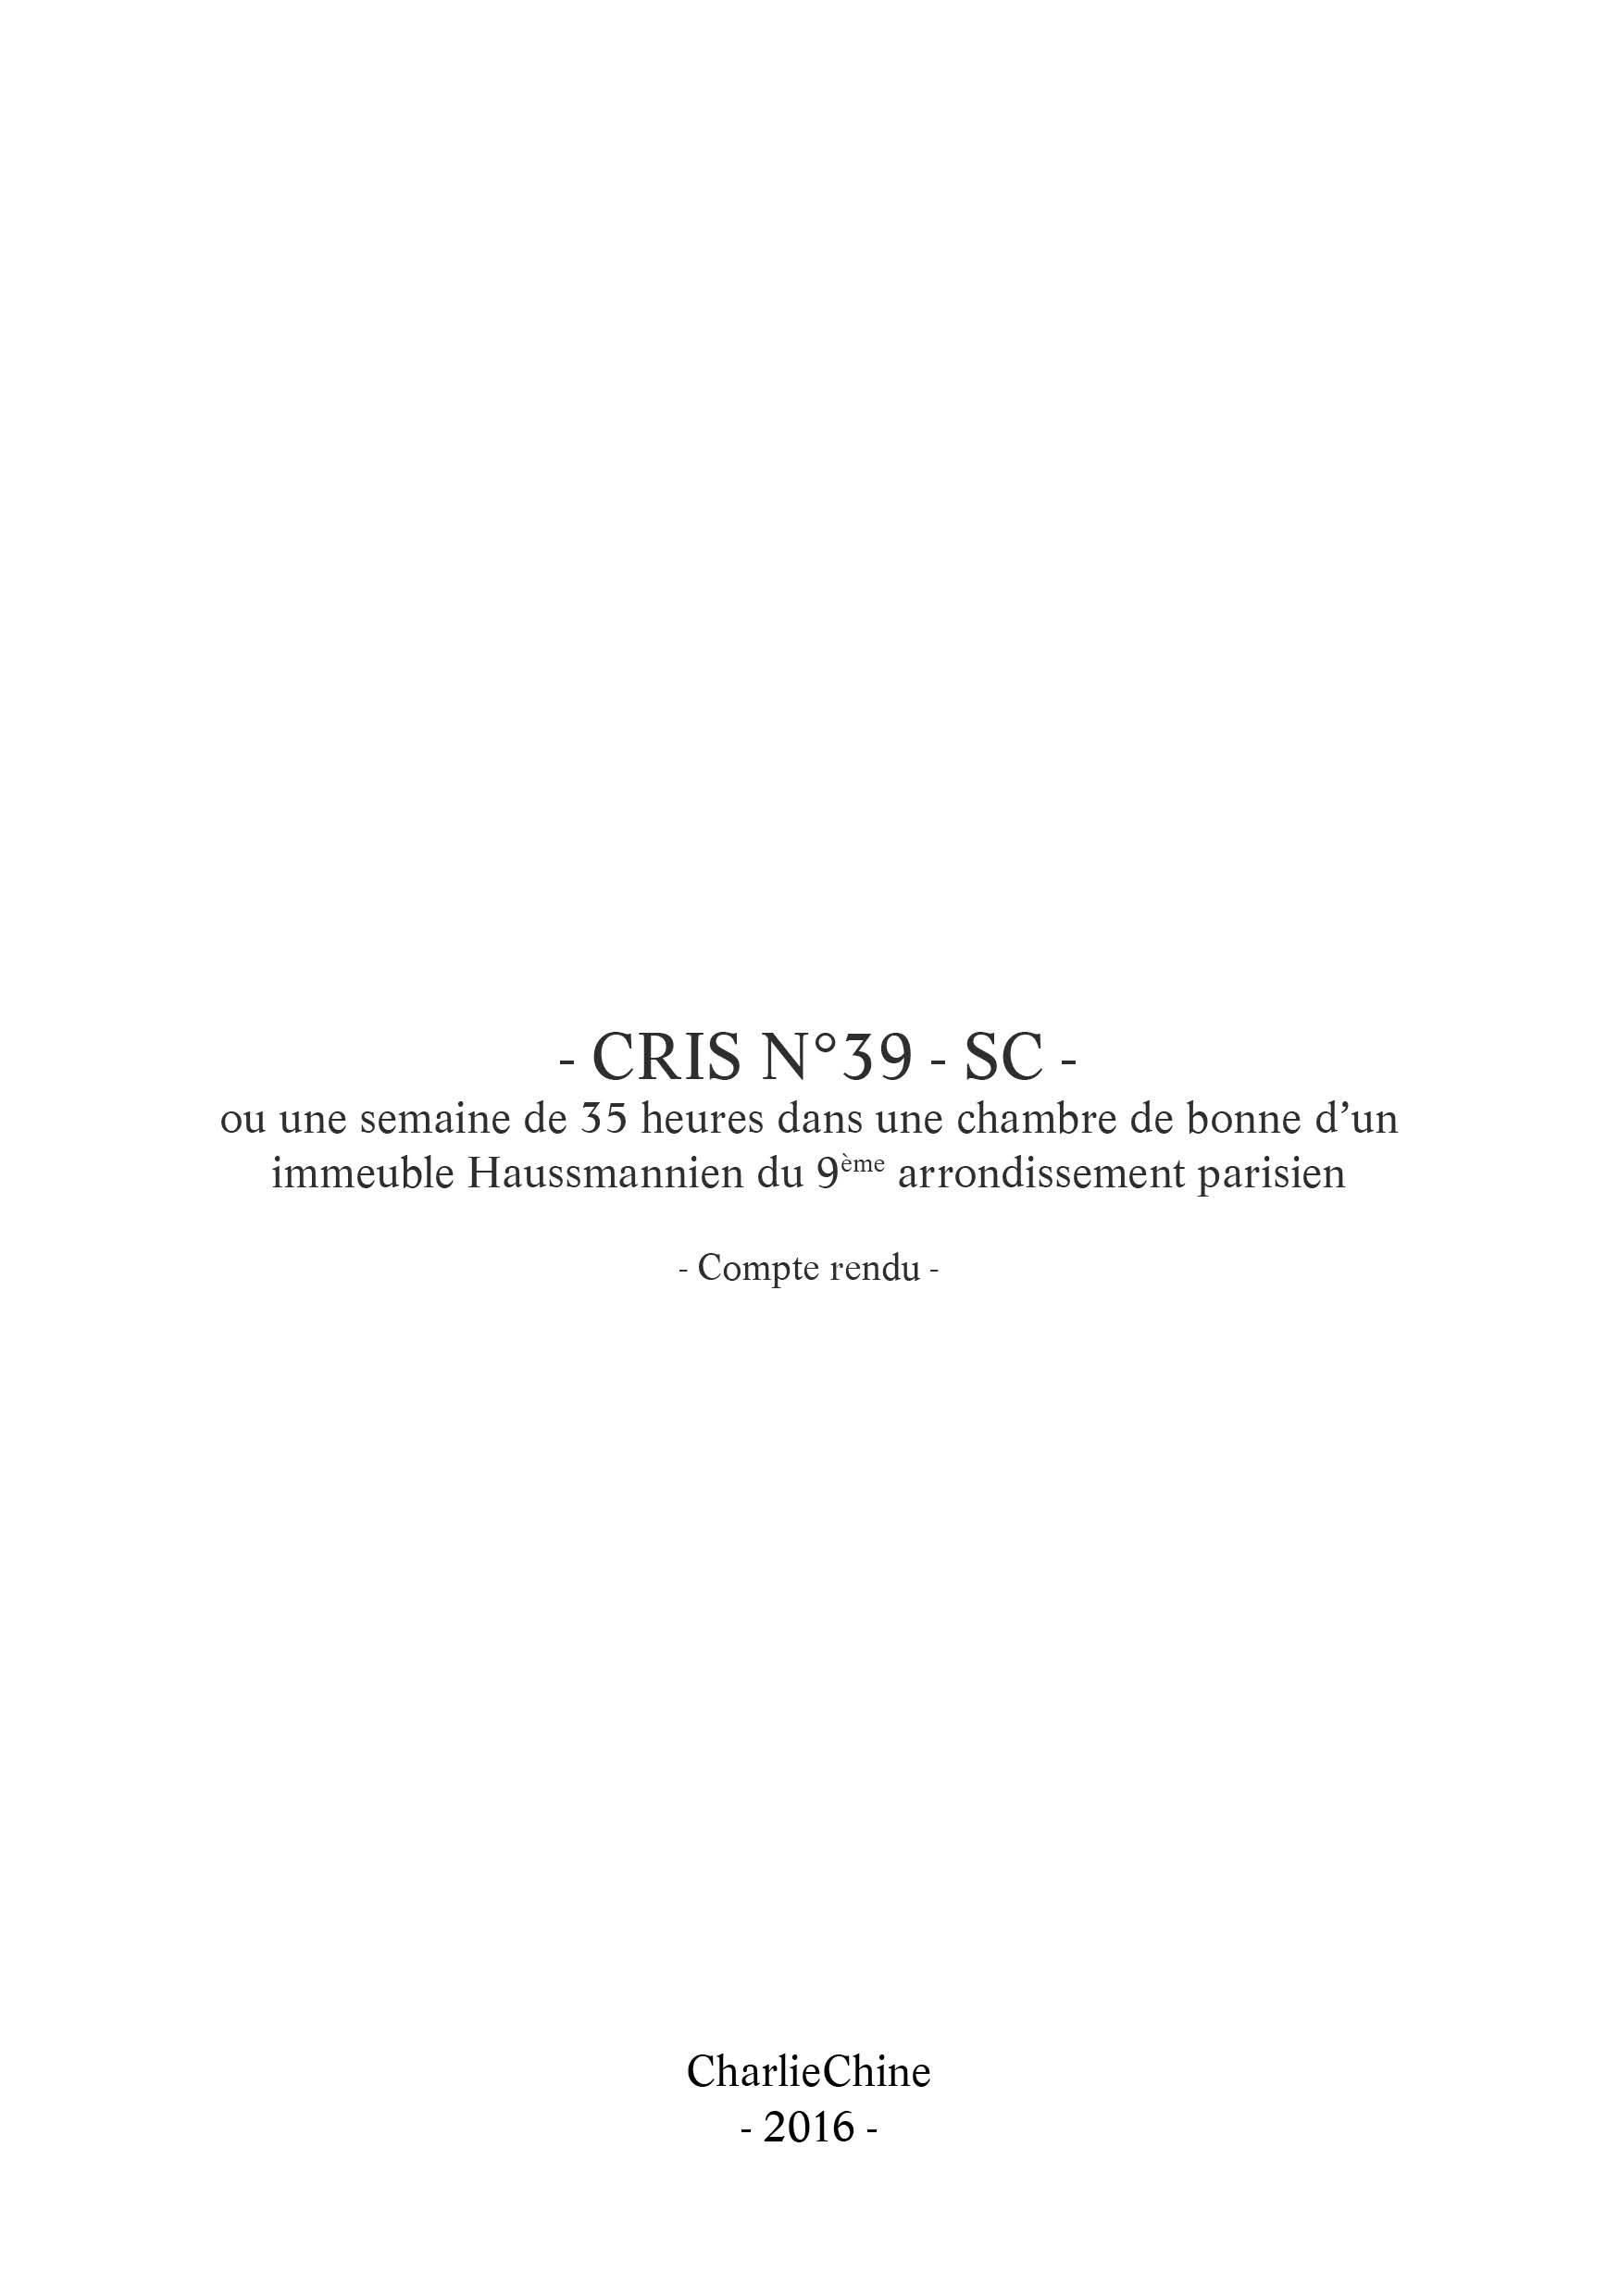 2016_Cri_n°39-SC_Rapport©CharlieChine